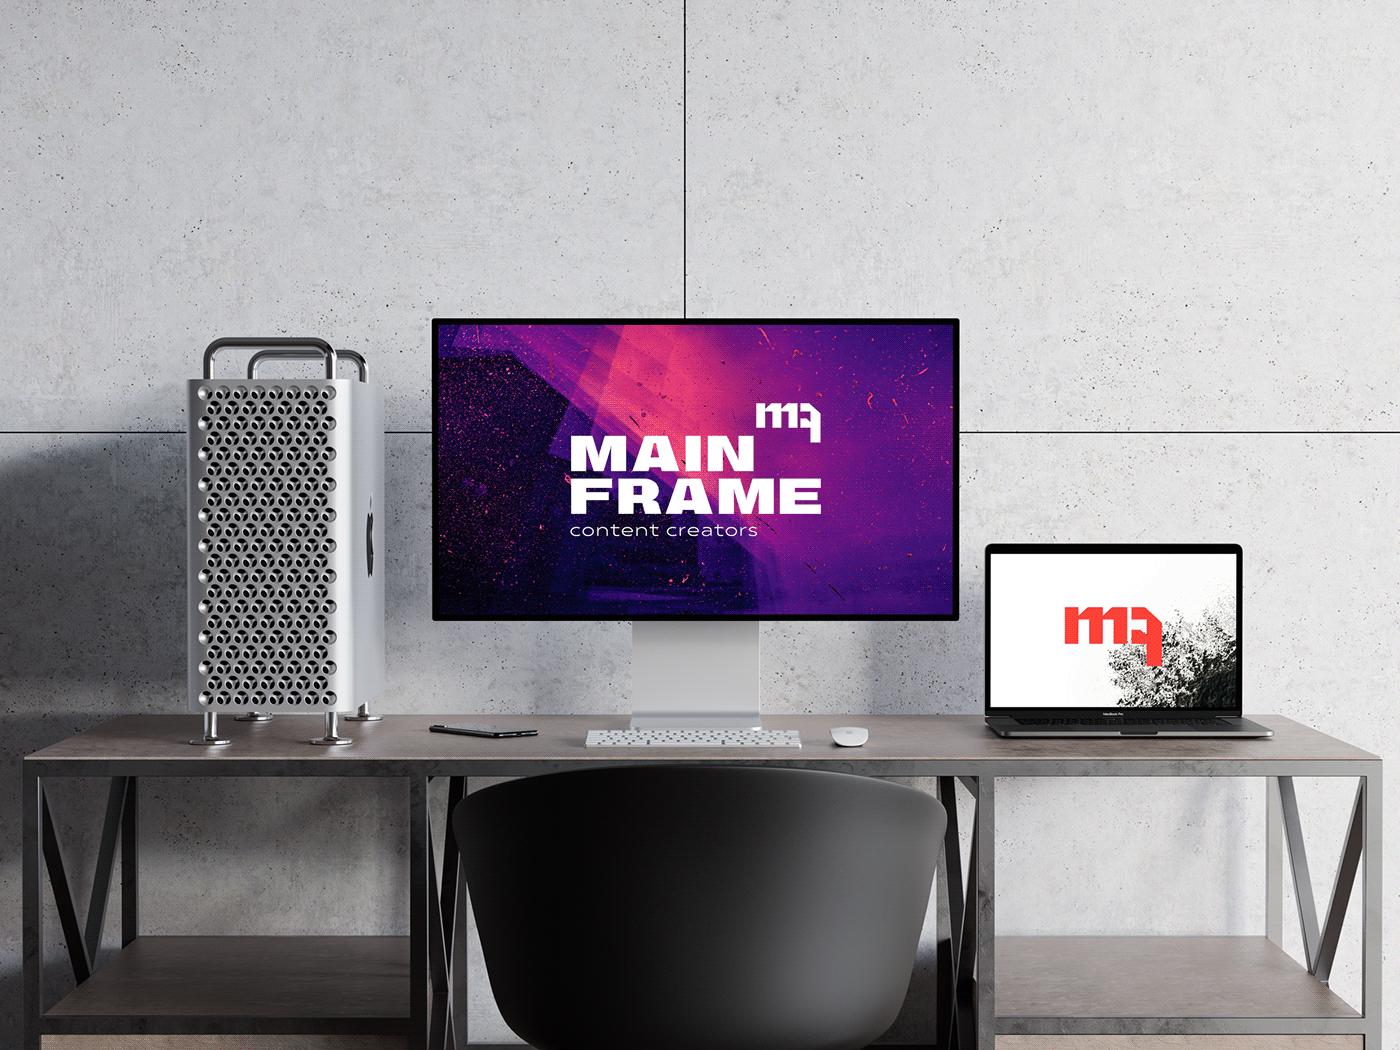 Image may contain: wall, computer and television